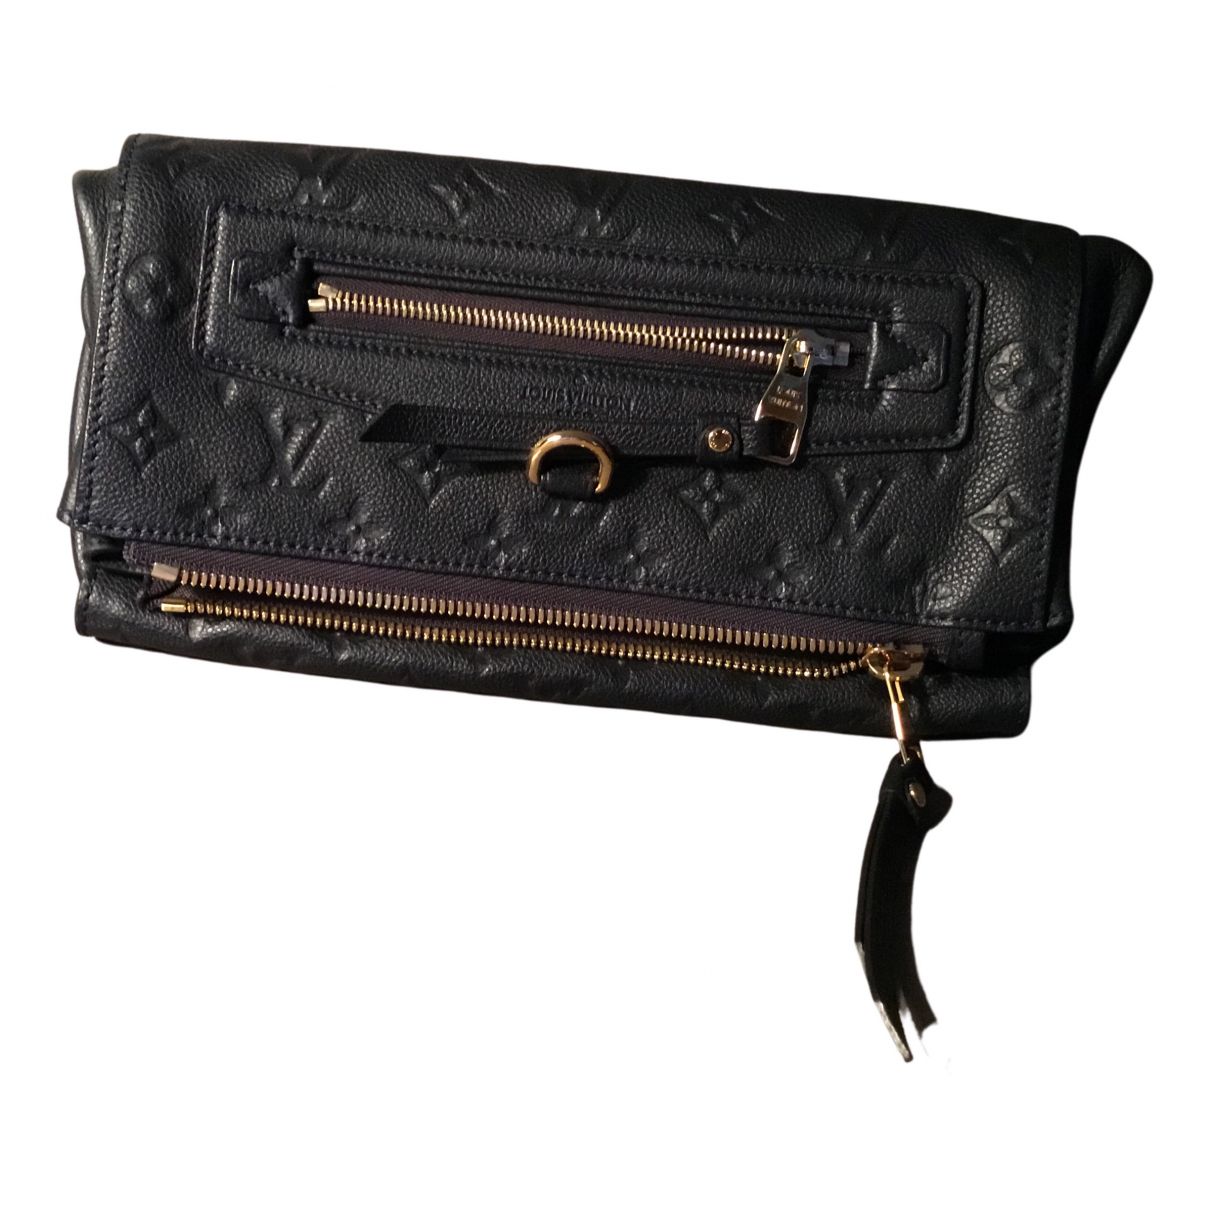 Louis Vuitton N Blue Leather Clutch bag for Women N